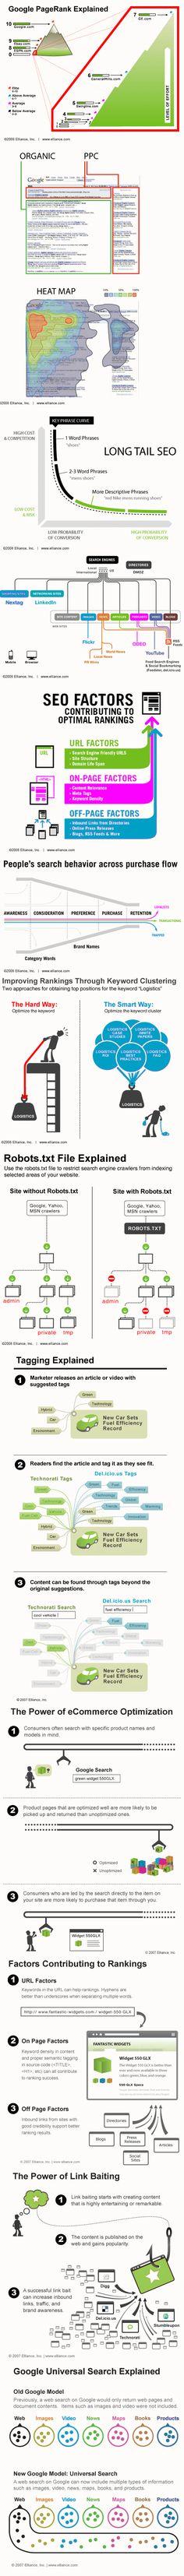 Infographic -SEO Explained